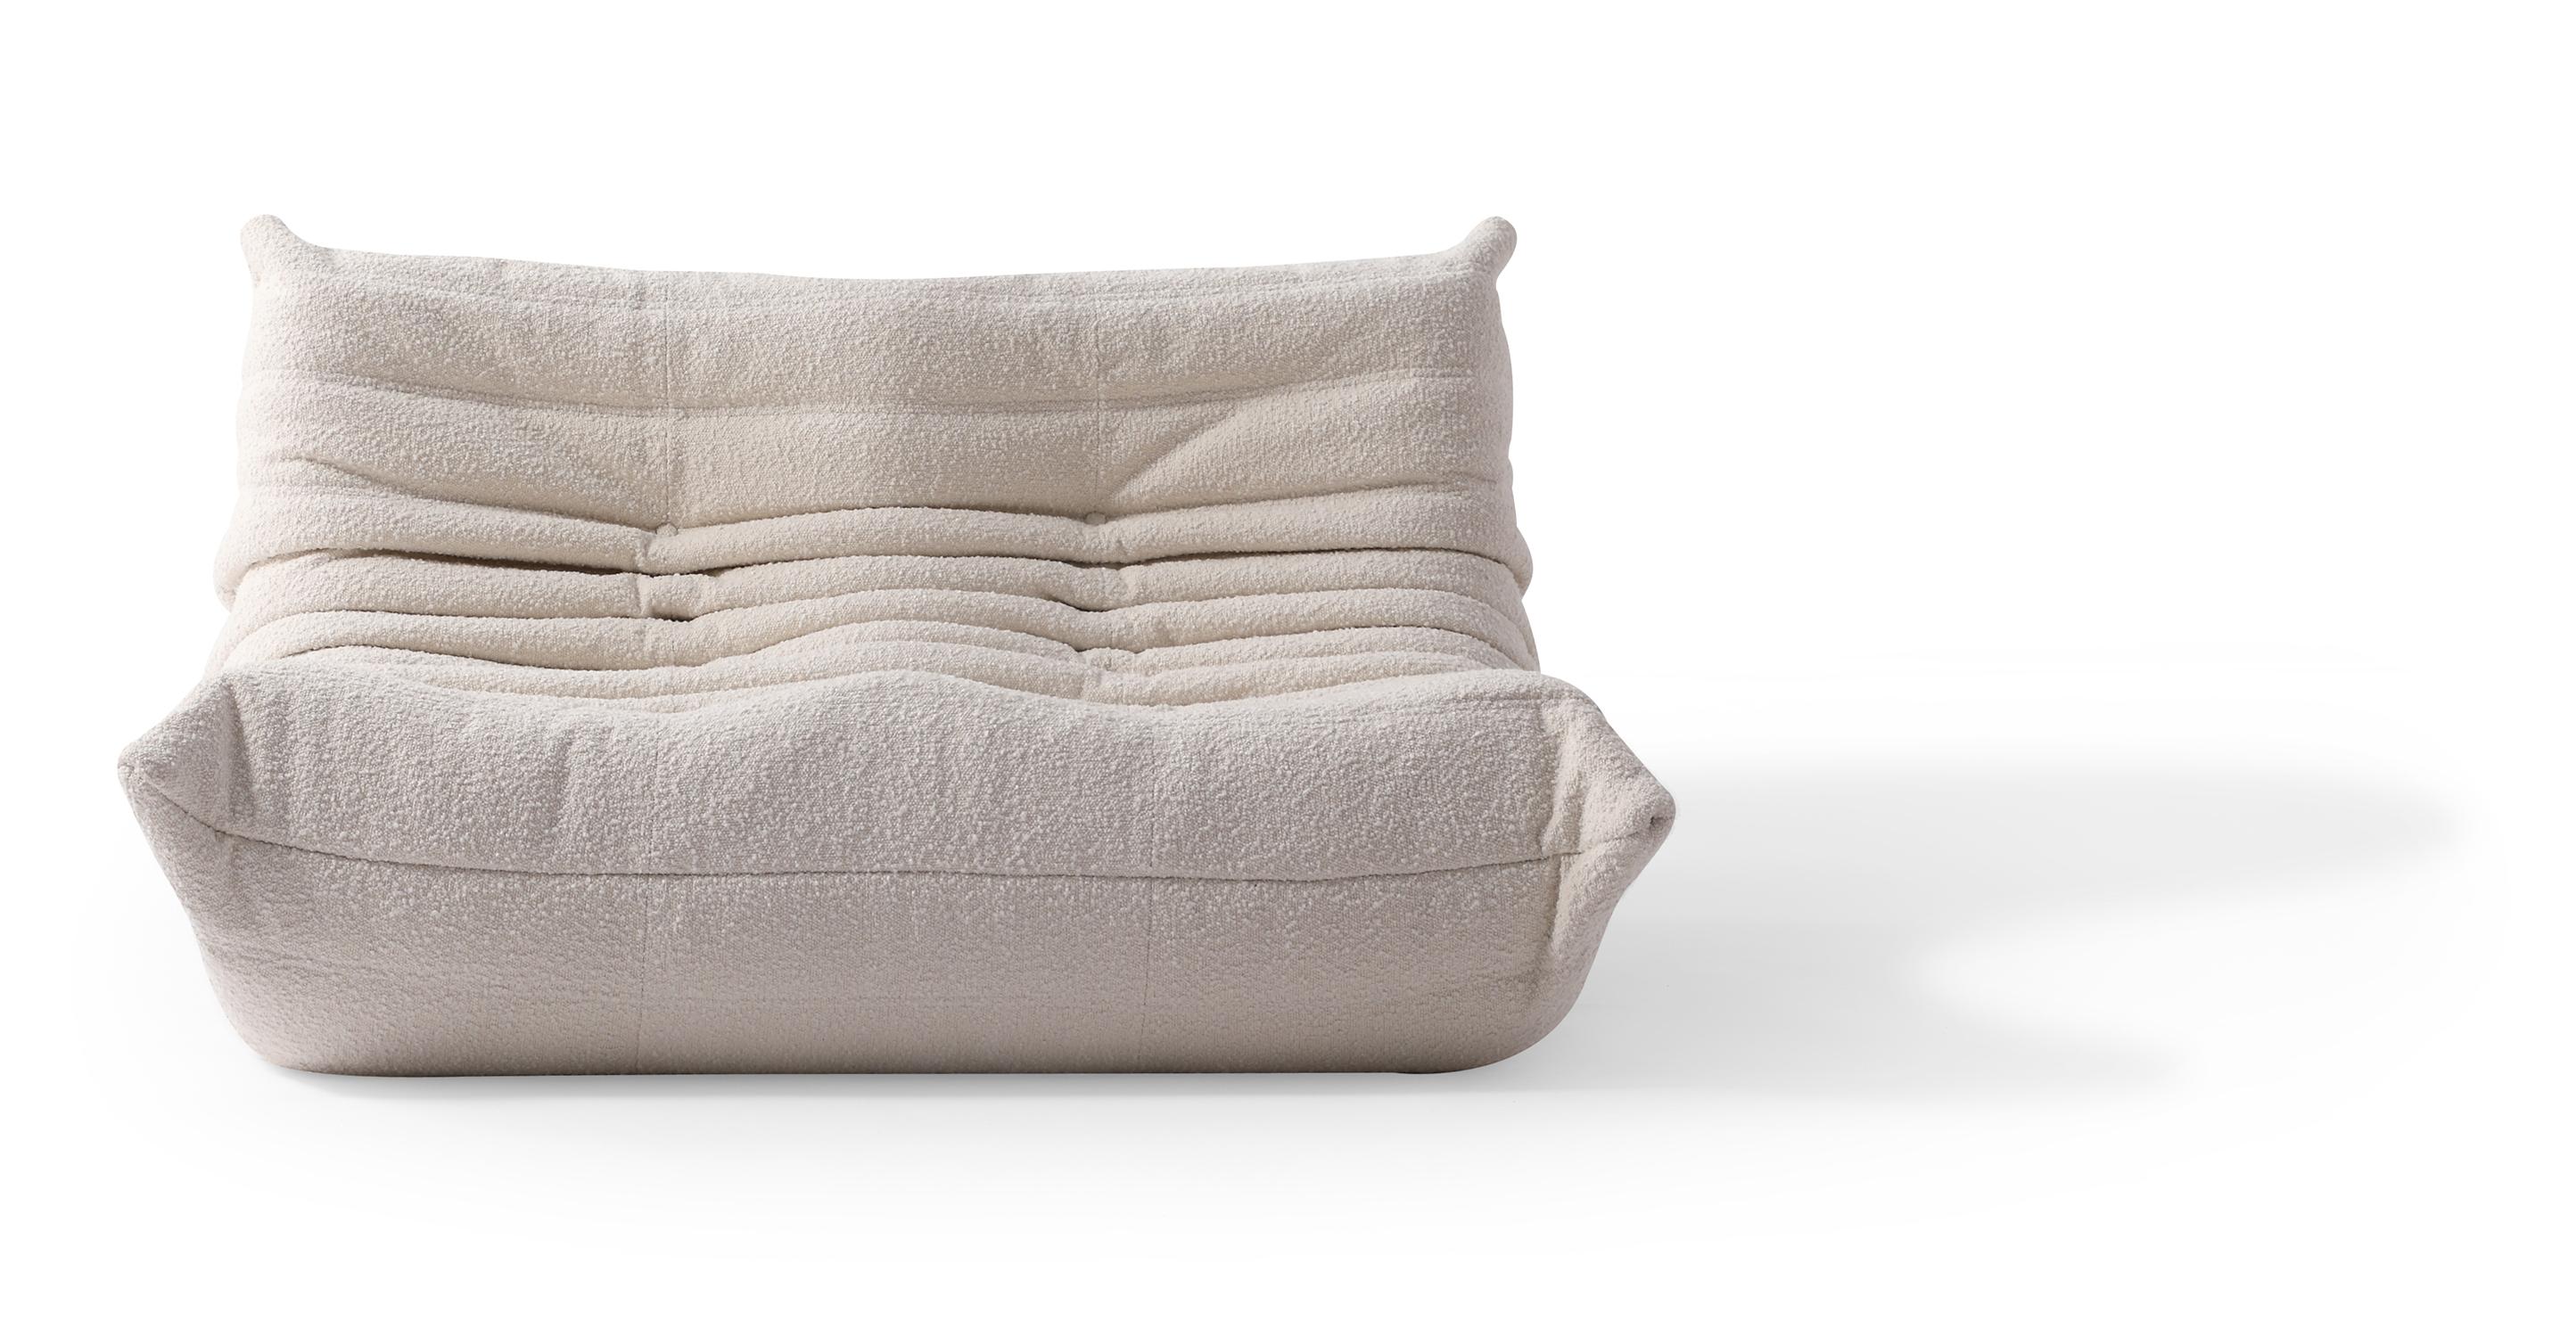 "Louvre 53"" Fabric 2-Seat Sofa, Blanc Boucle"